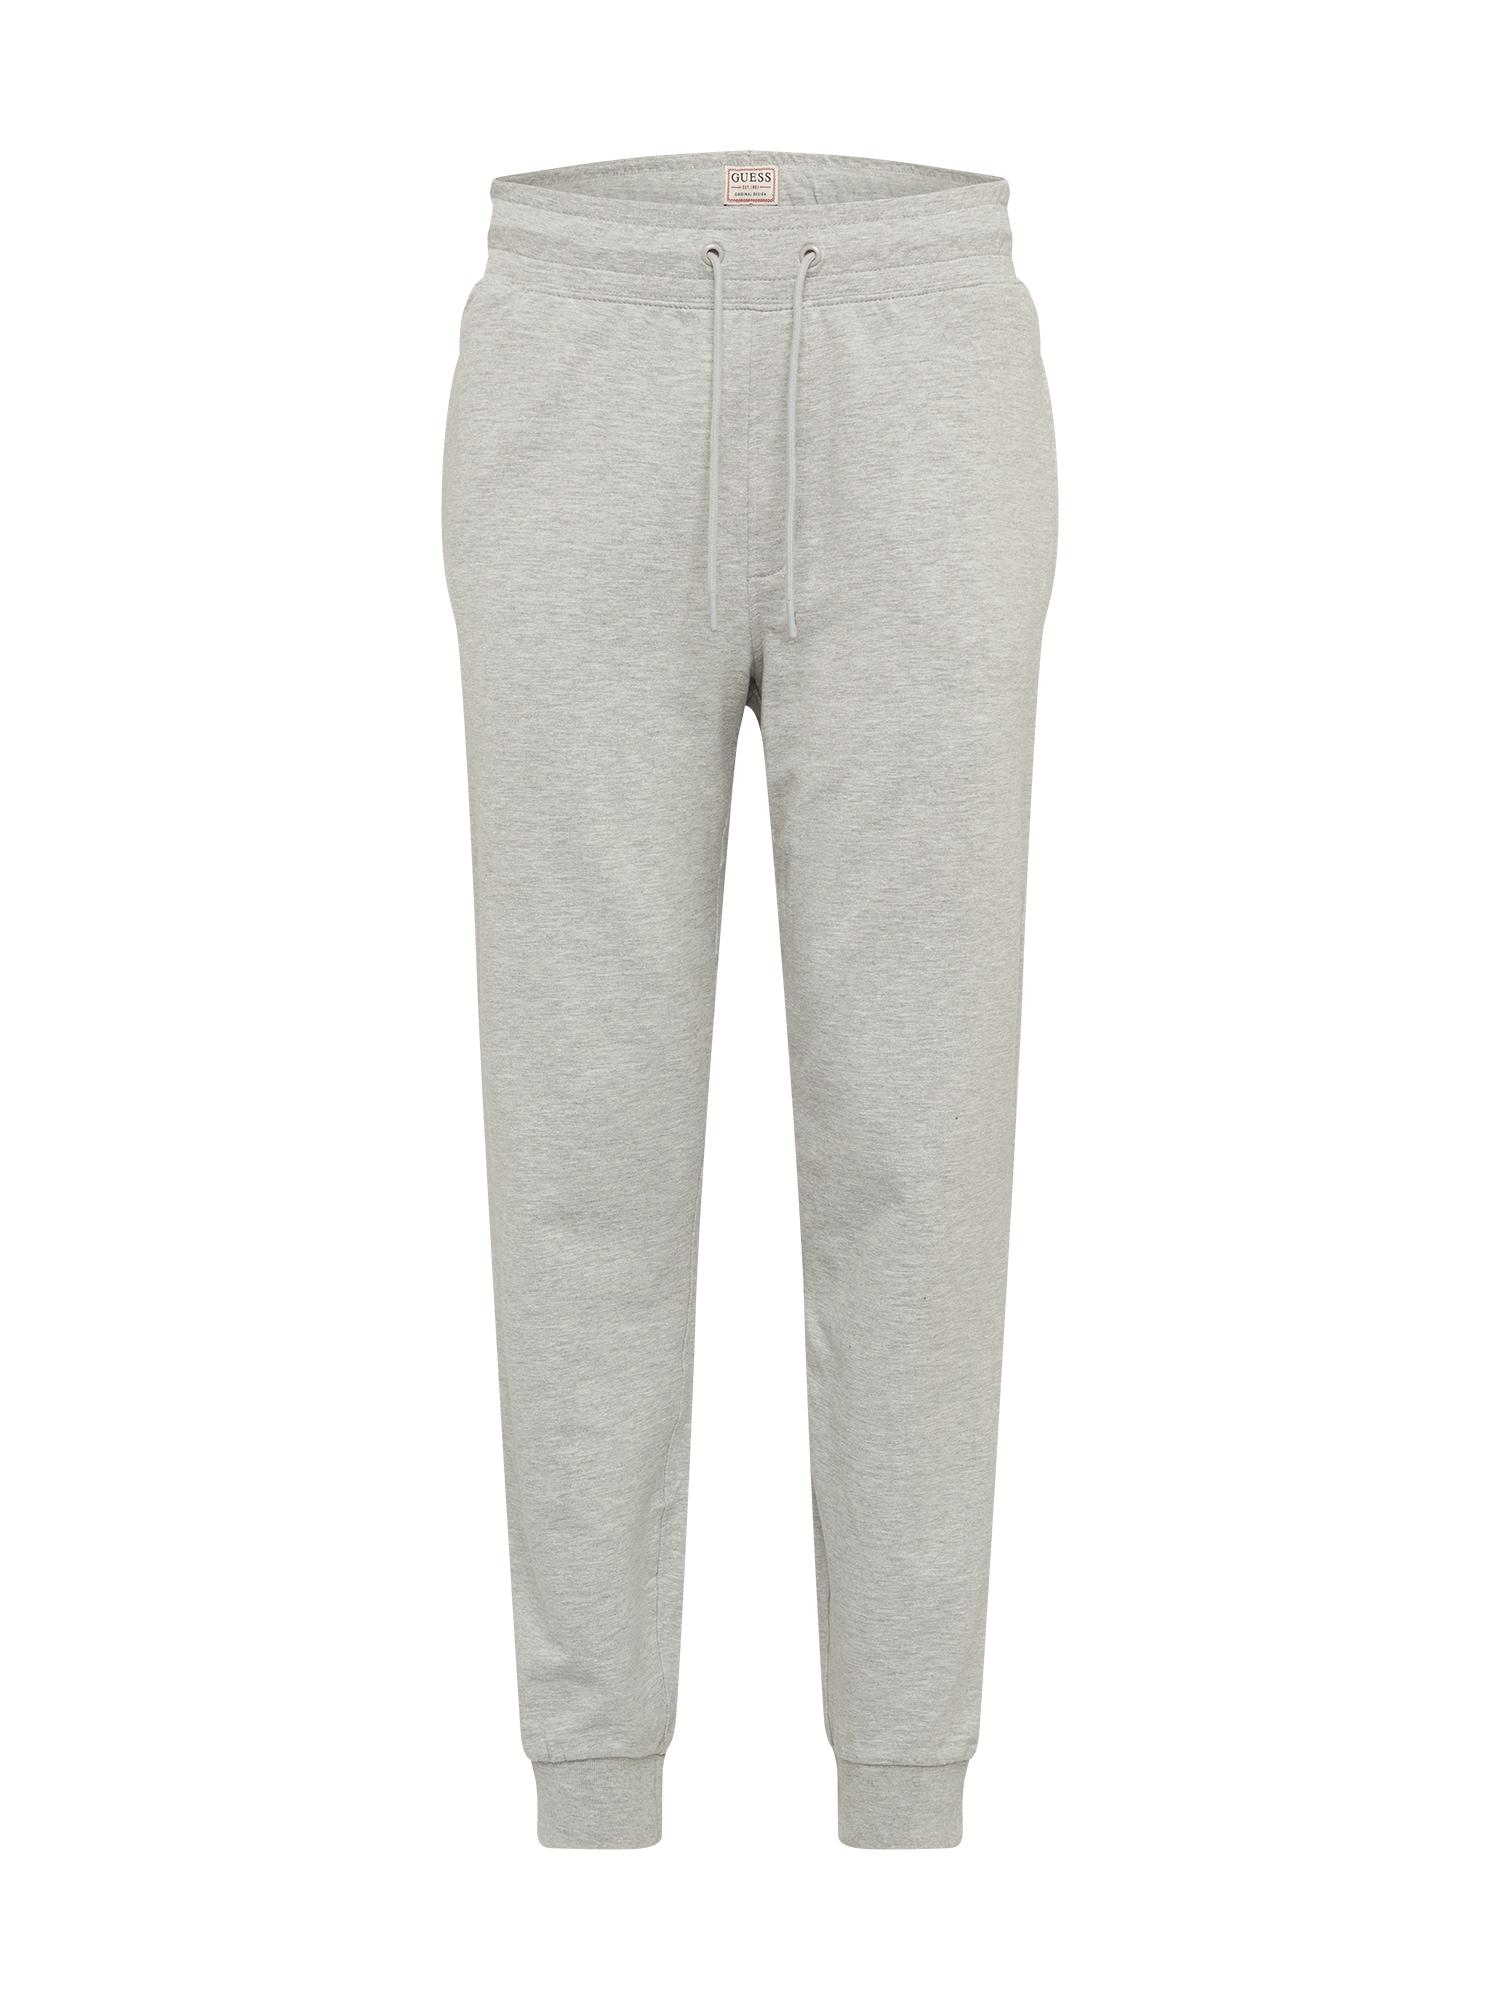 GUESS Kelnės 'ADAM' margai pilka / balta / melionų spalva / juoda